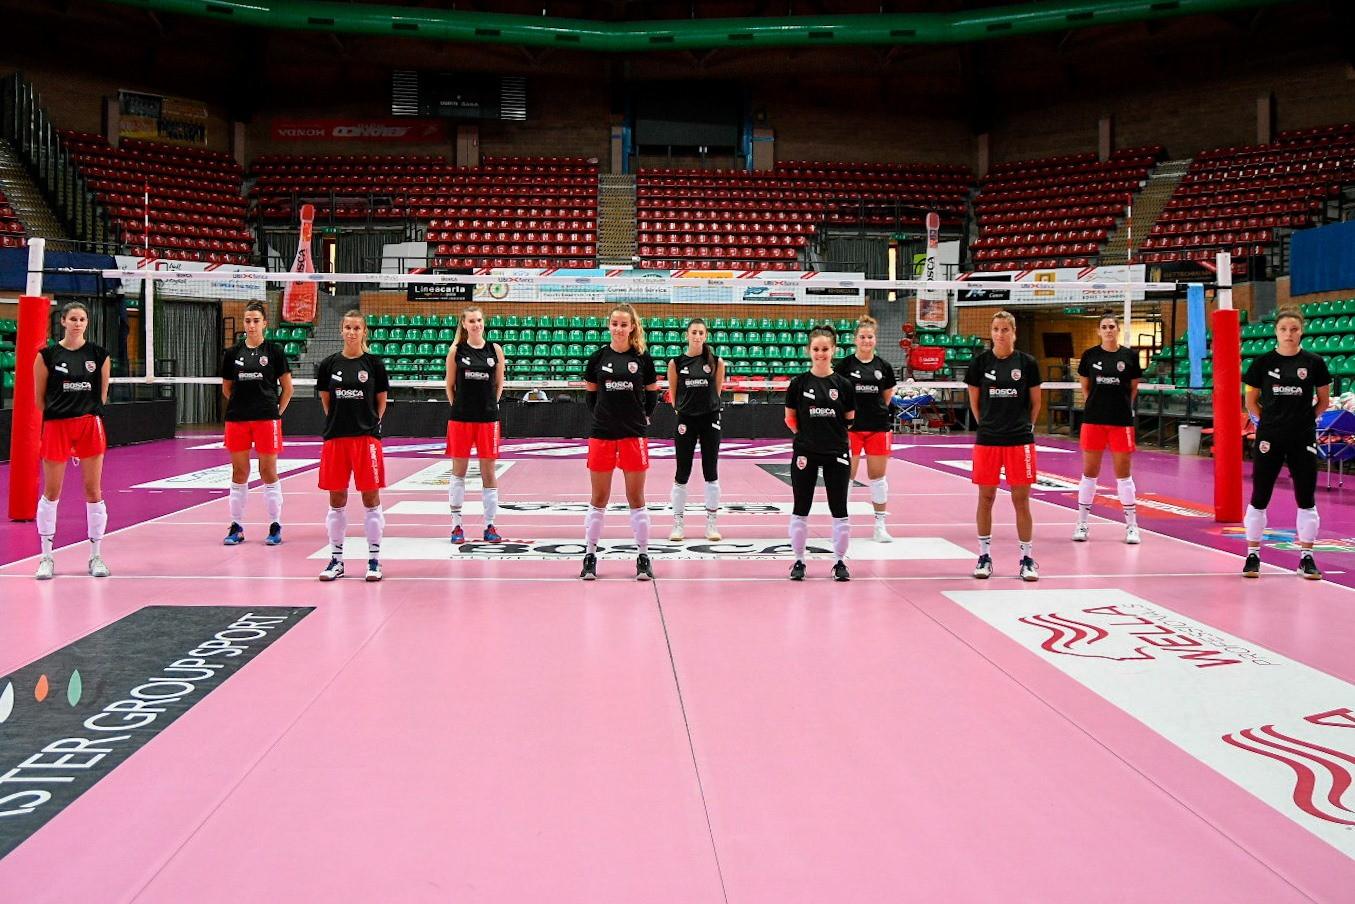 Foto di squadra per la Bosca S.Bernardo Cuneo.